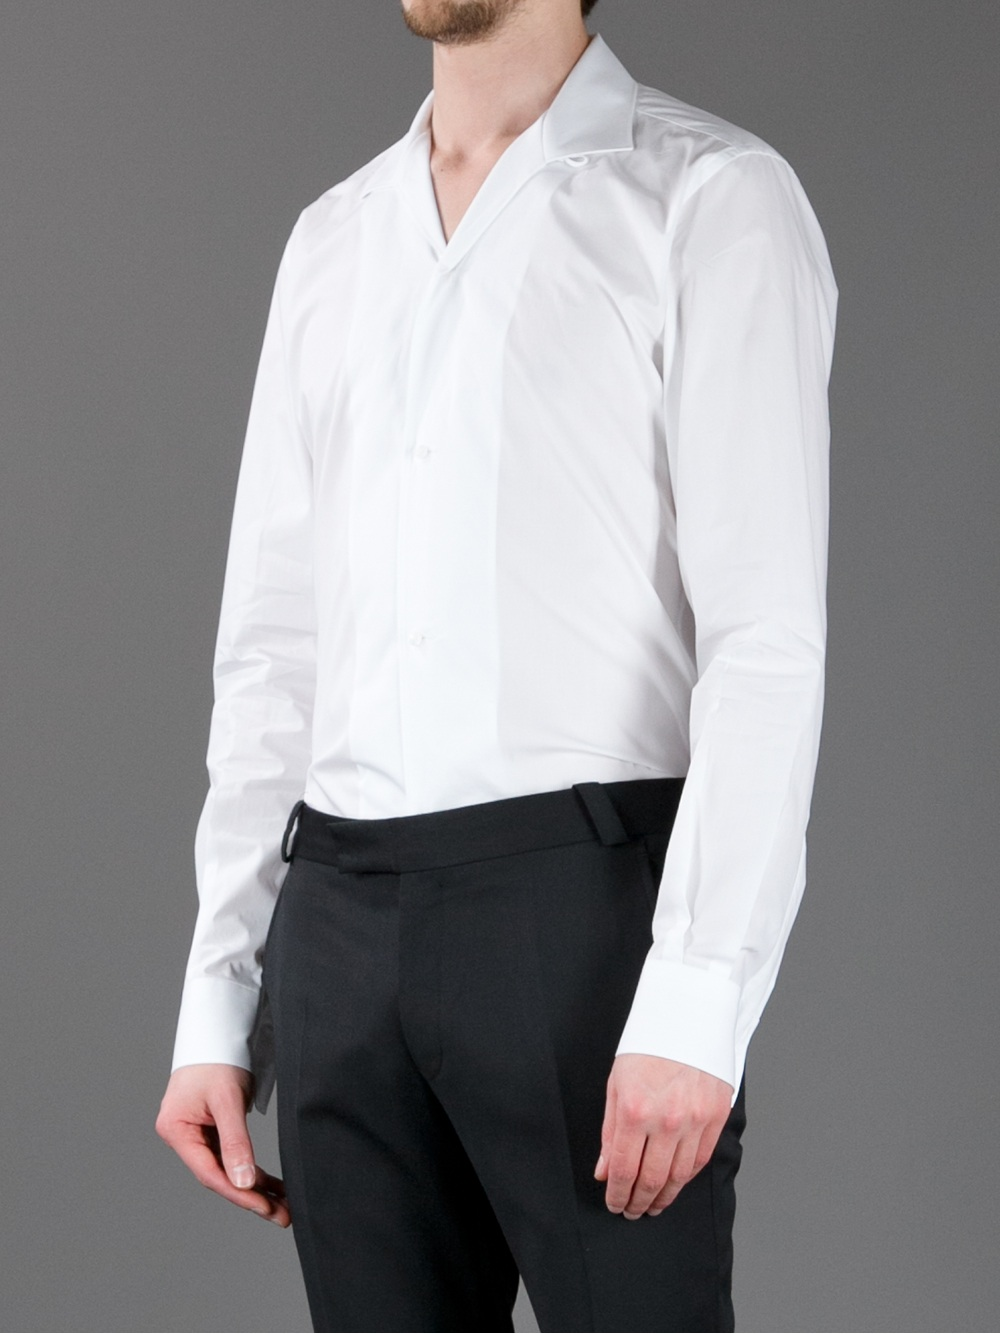 Lyst - Dolce & gabbana Open Collar Shirt in White for Men